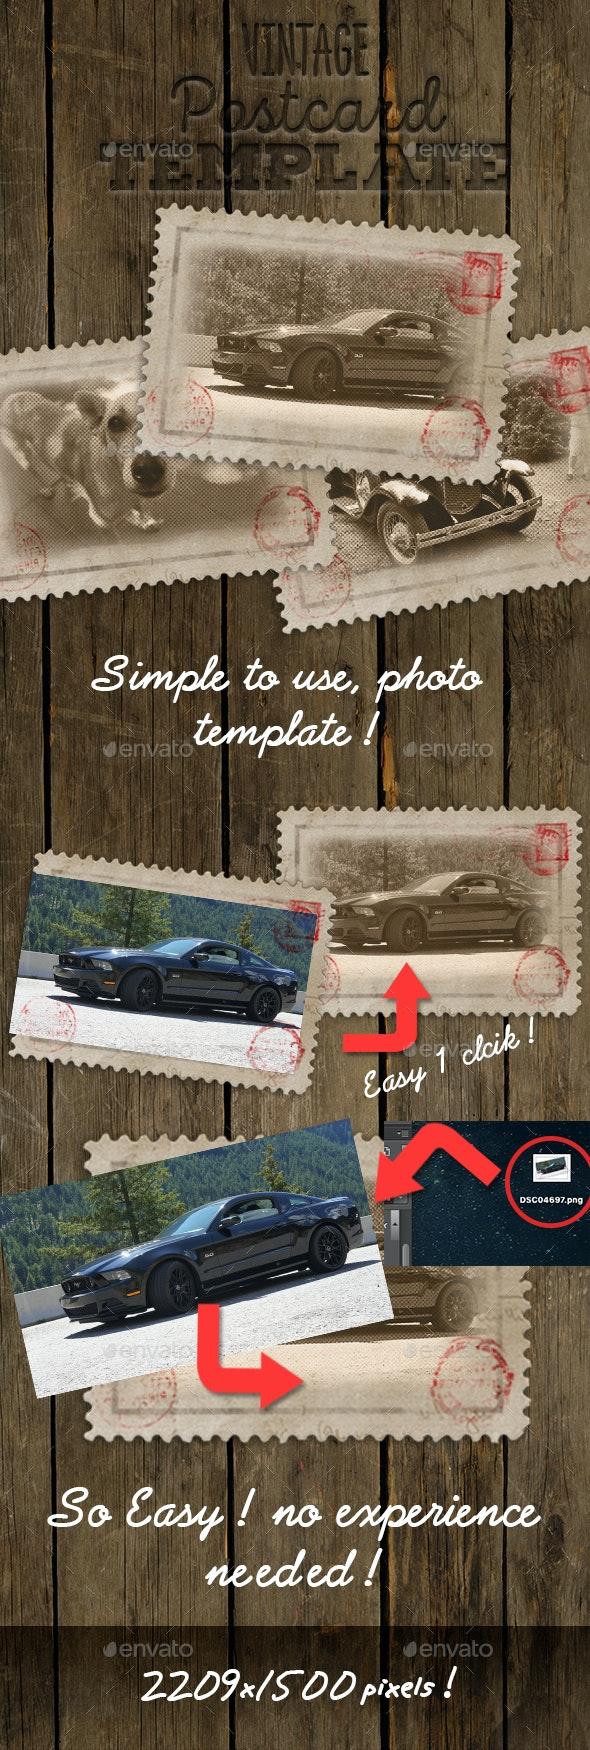 Vintage Postcard Template - Photo Templates Graphics